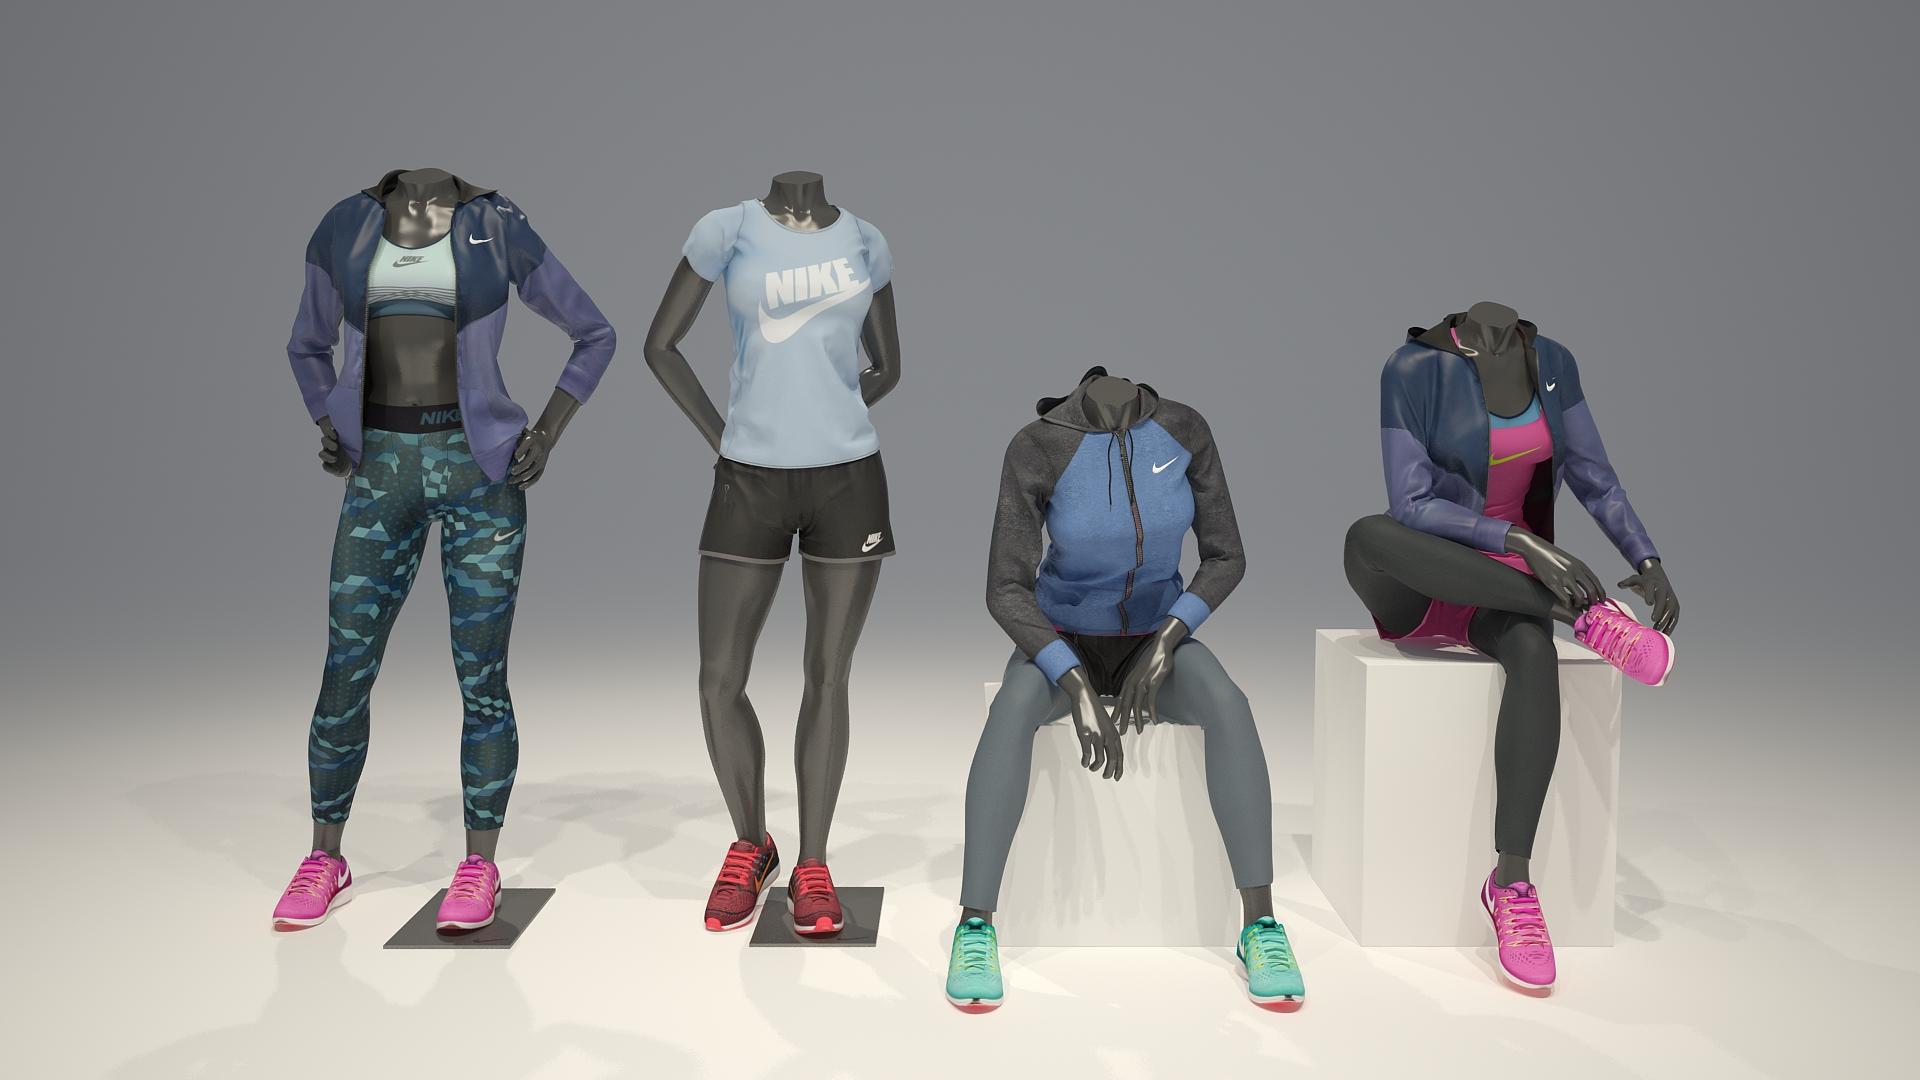 Female Mannequin Nike Pack 3 3d Model By Mrgarret 3docean